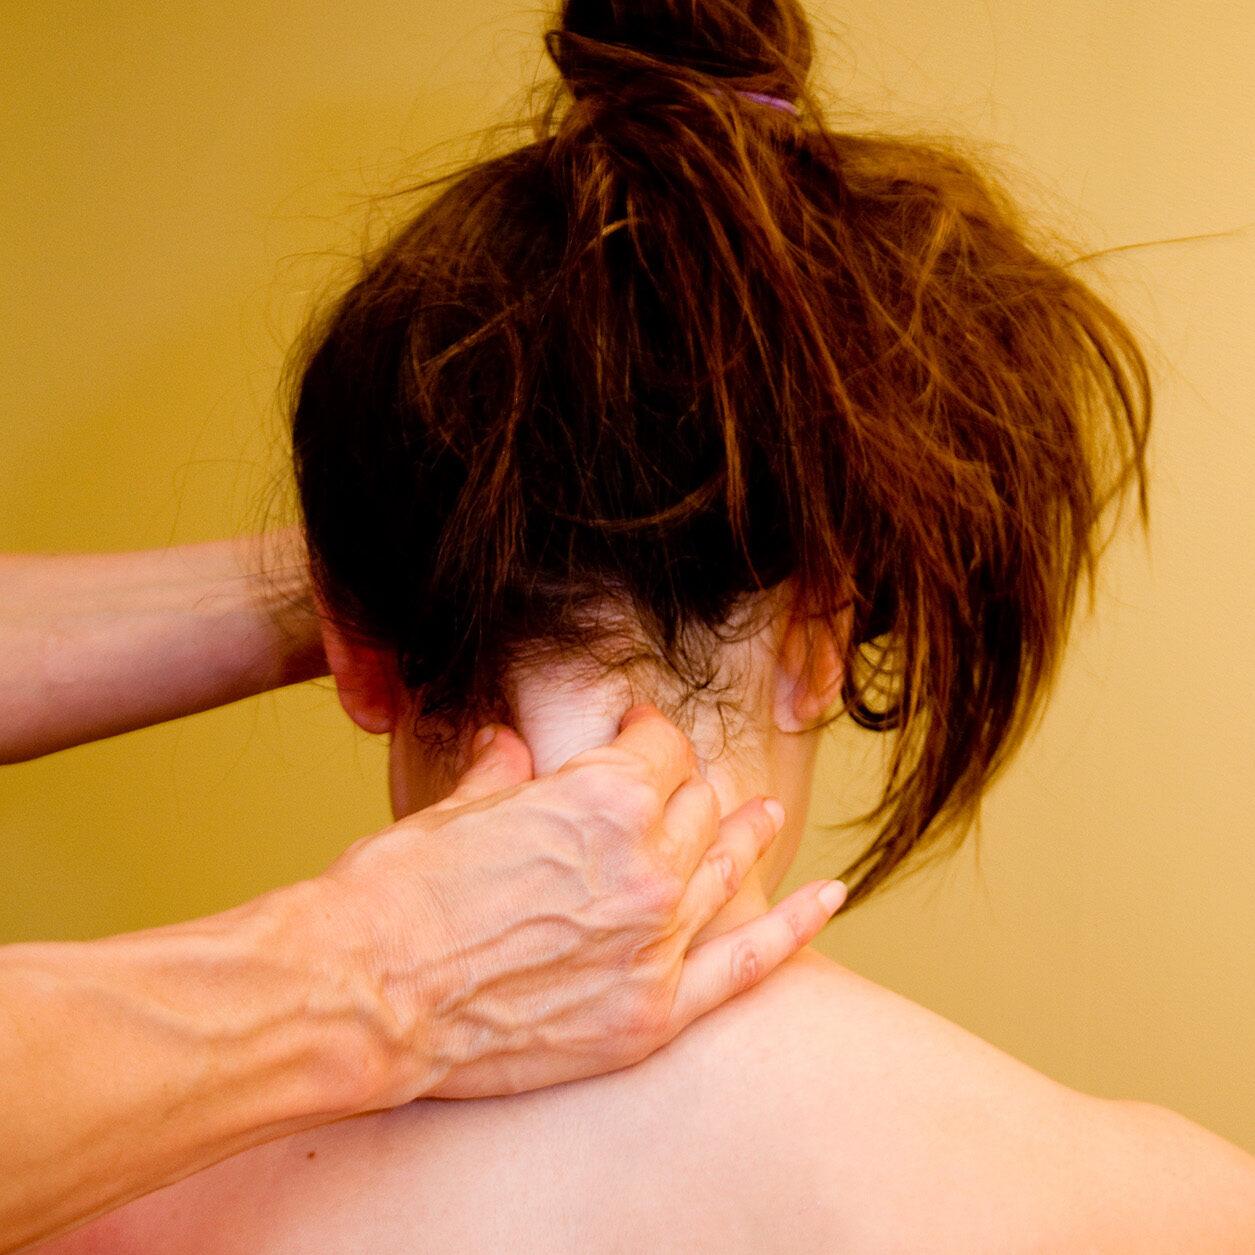 Nackmassage